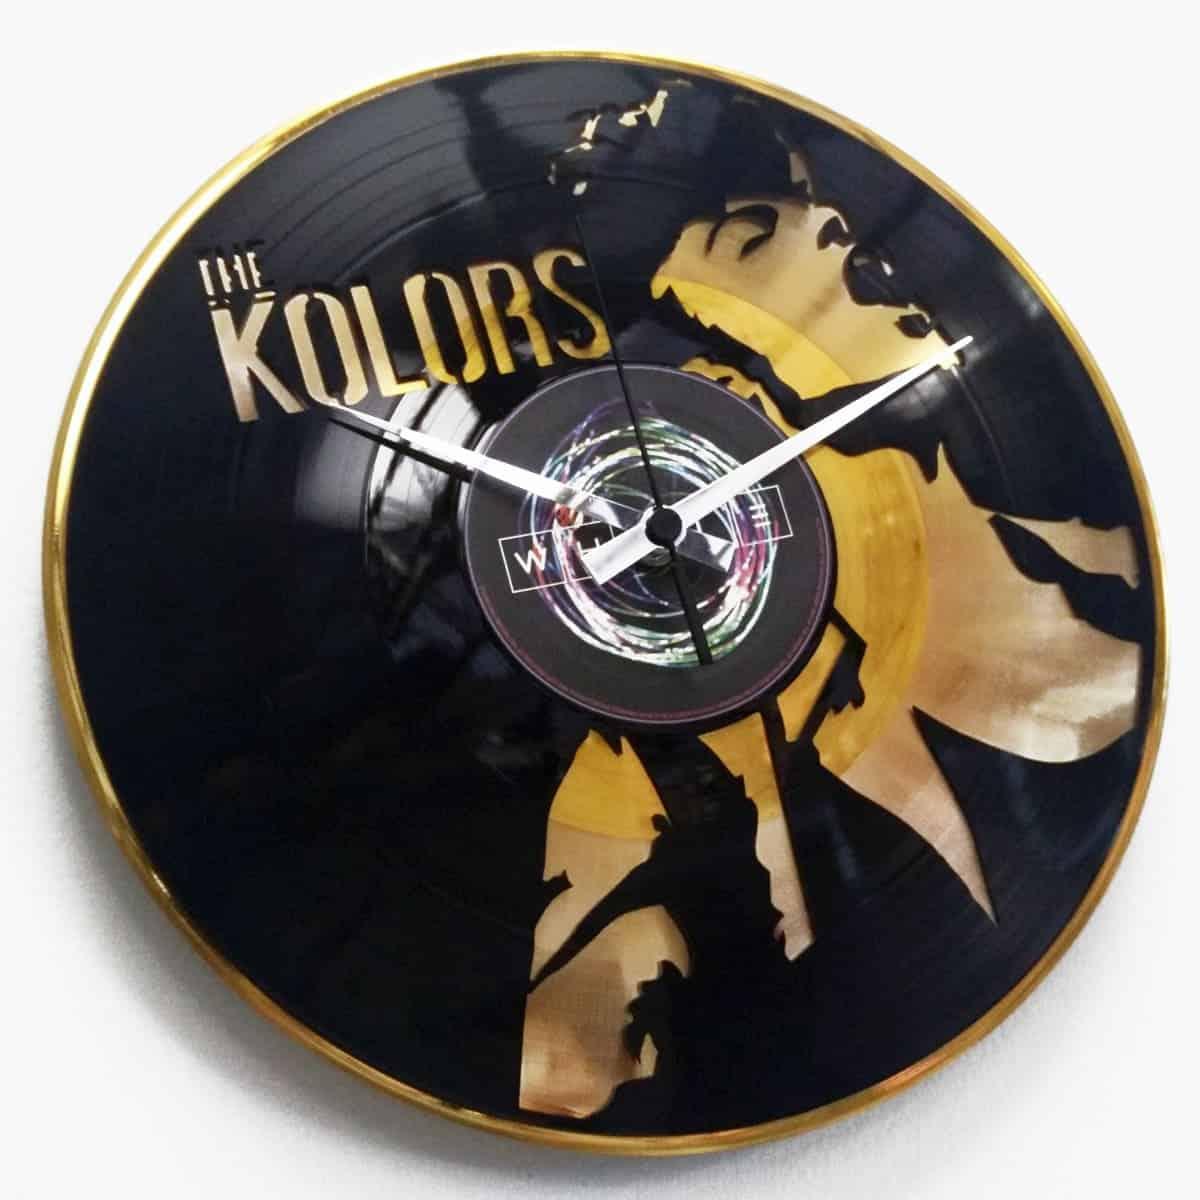 orologio-vinile-the-kolors